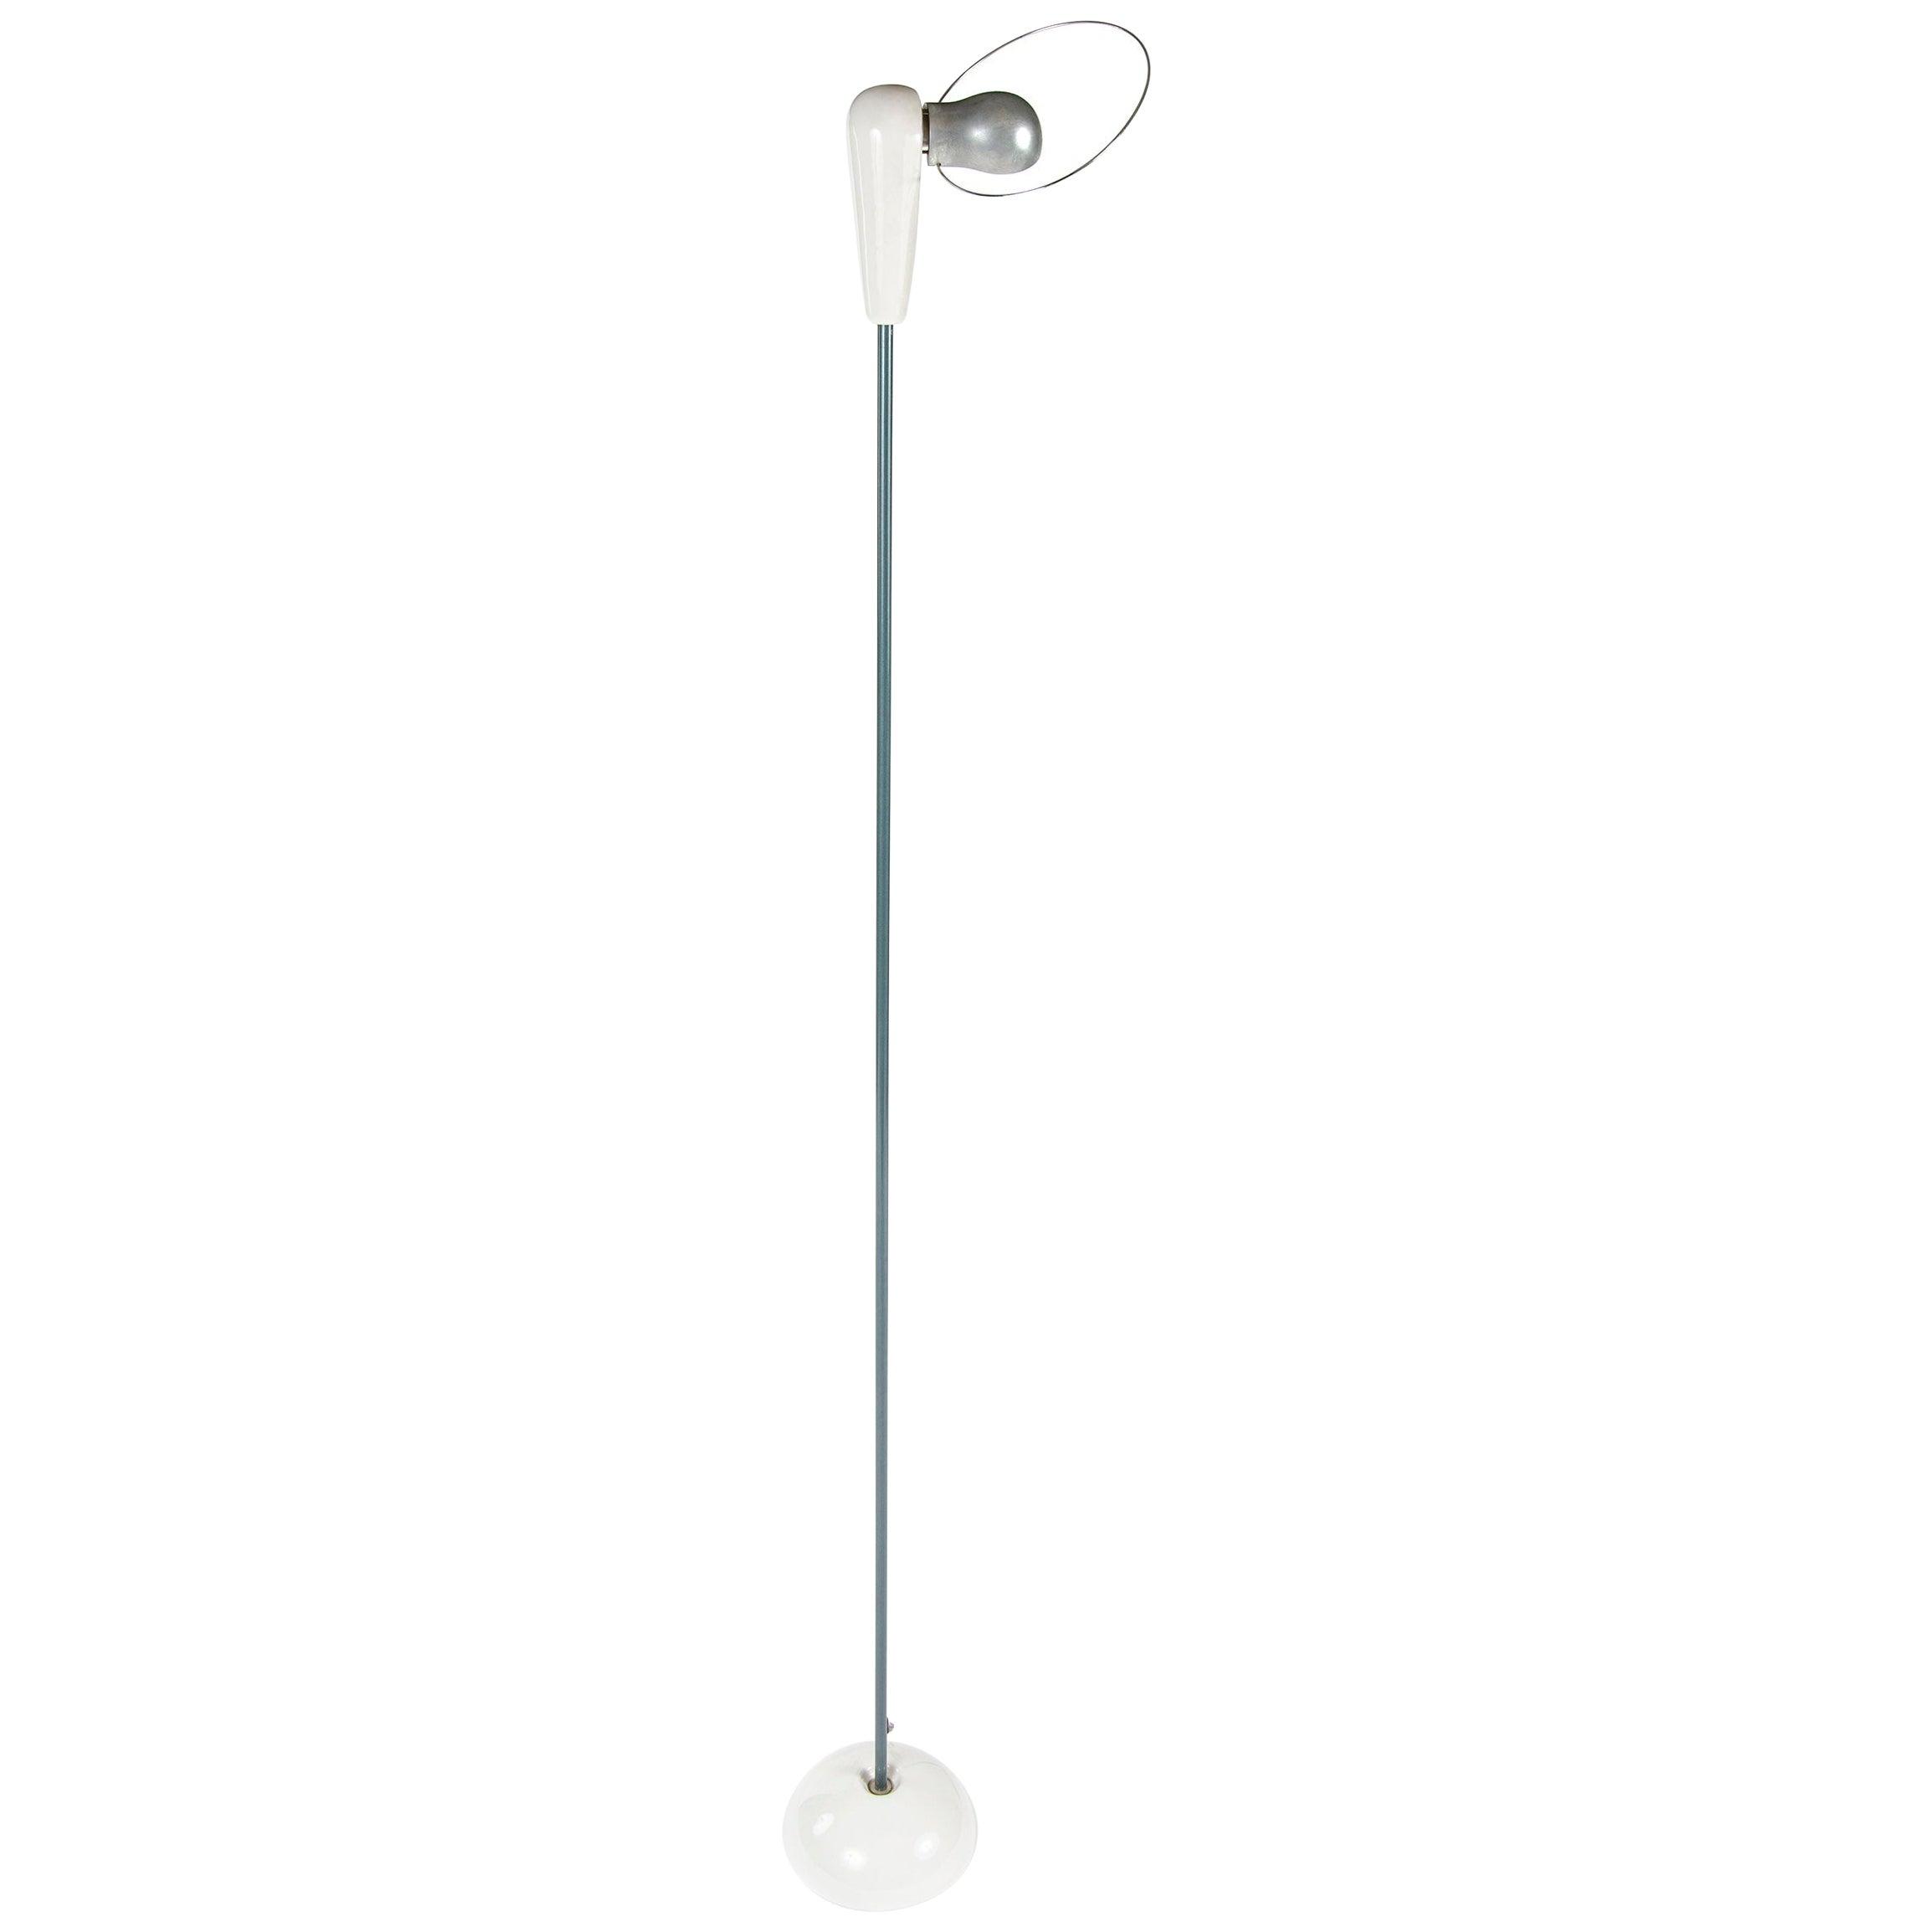 'Bi Bip' Floor Lamp by Achille Castiglioni for Flos